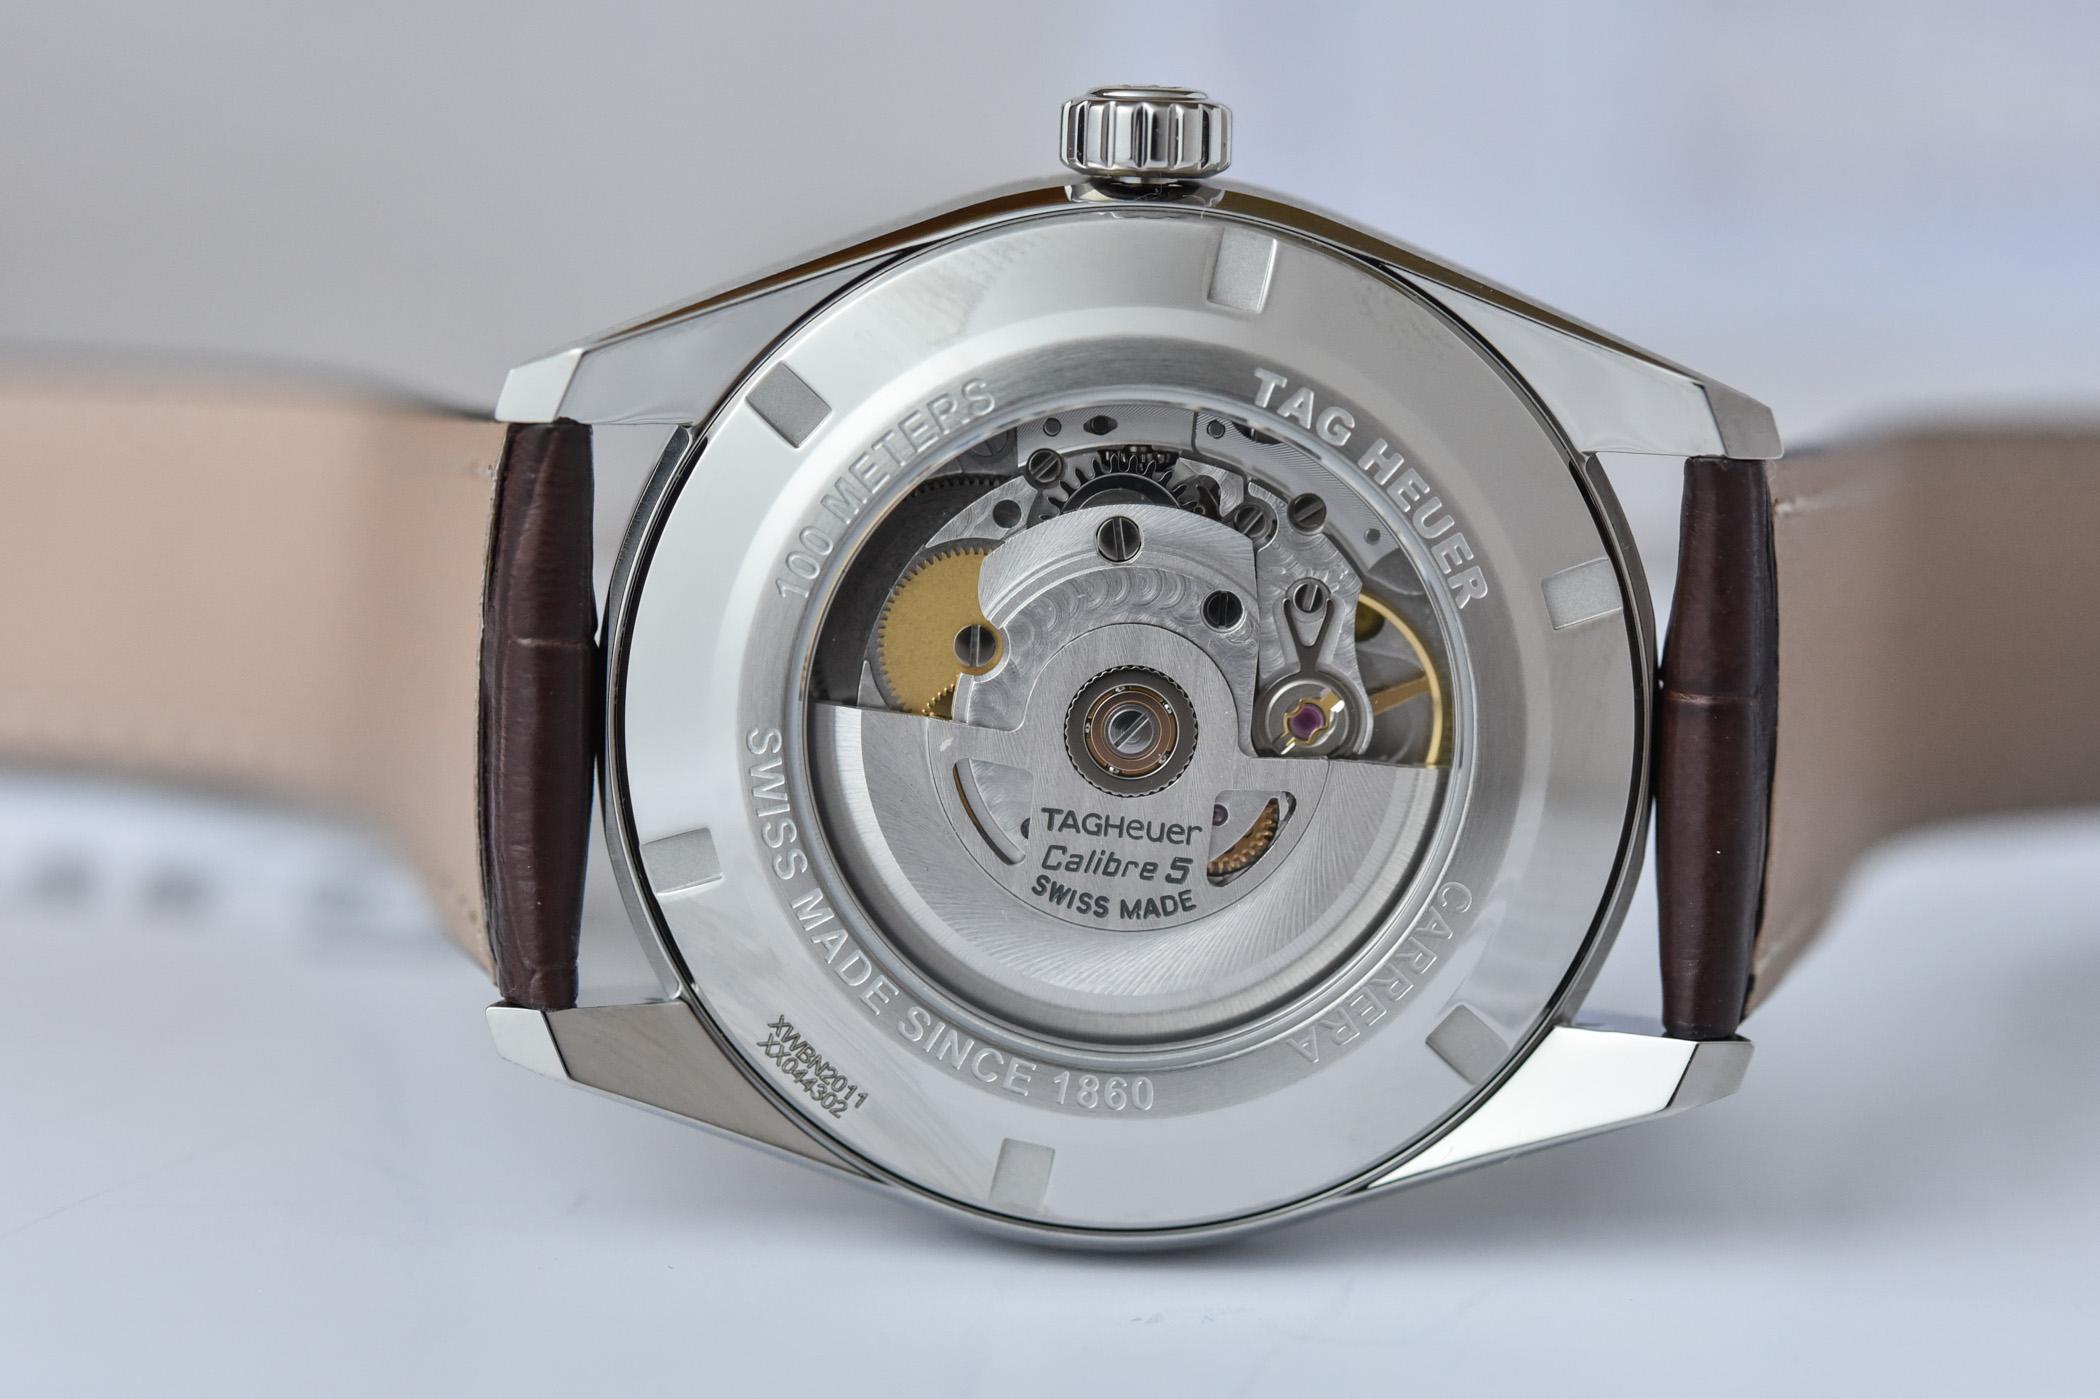 2021 TAG Heuer Carrera Day-Date 41mm WBN2011.FC6484 calibre 5